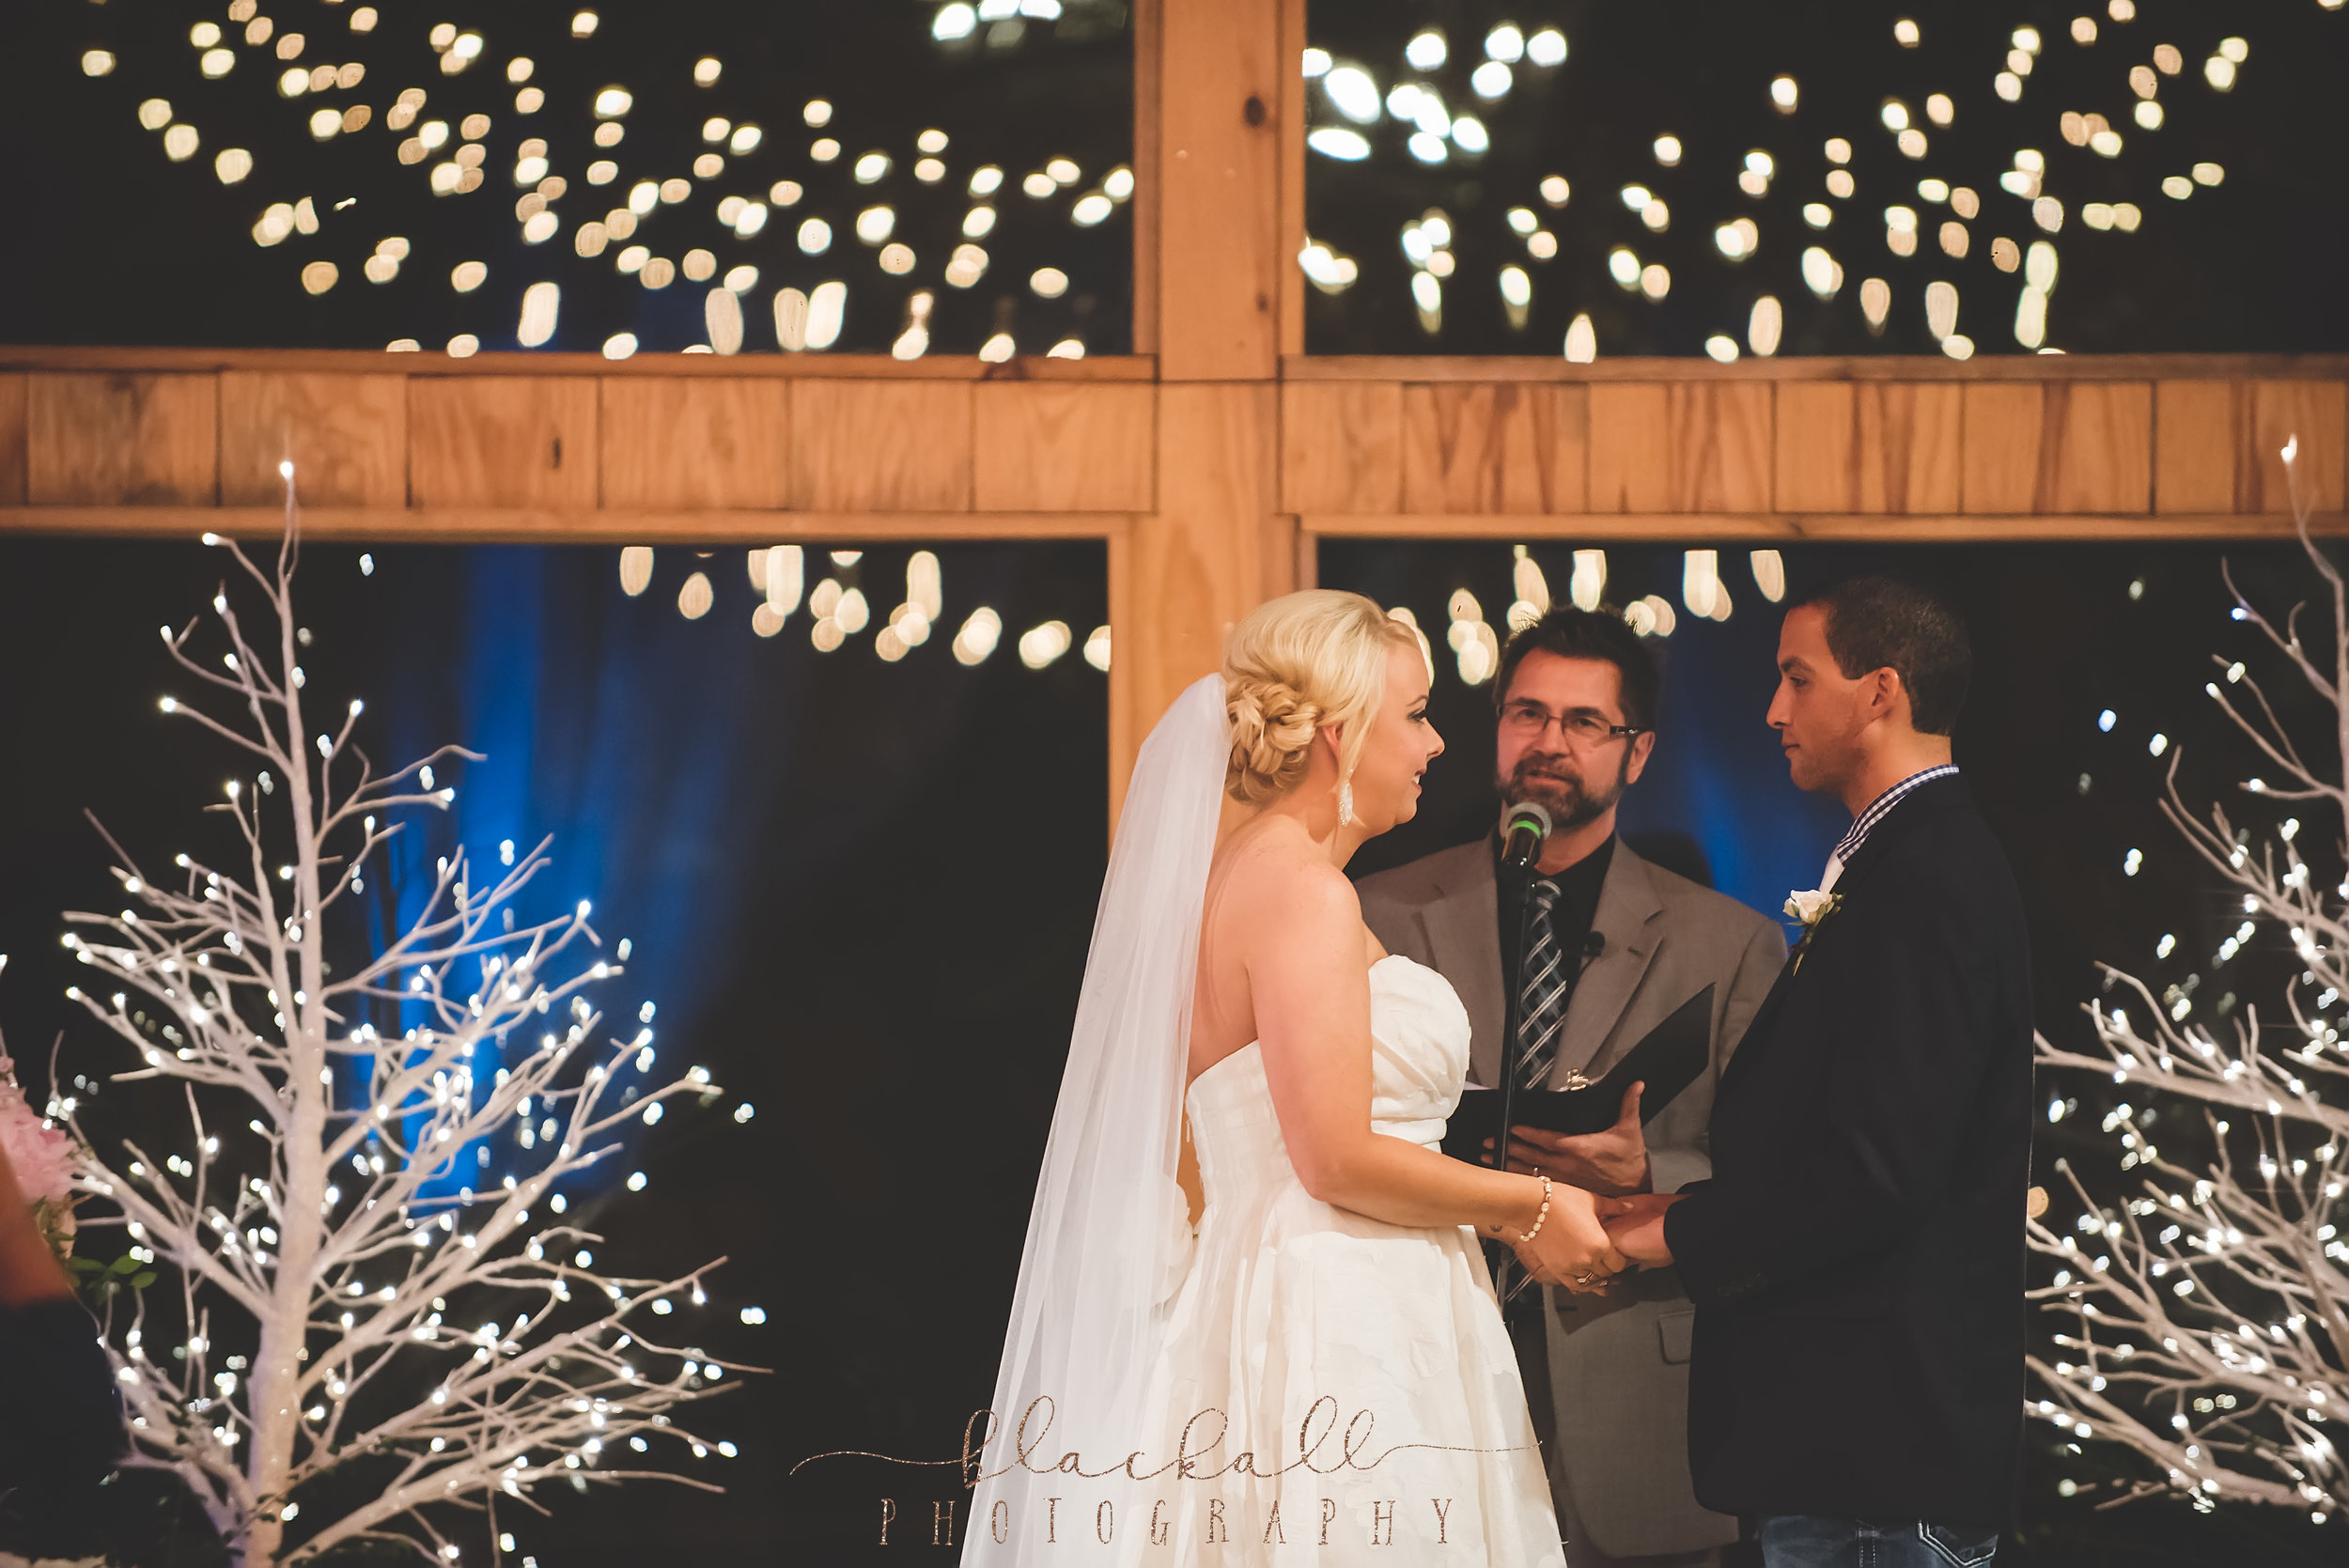 M&M WEDDING_Blackall Photography-42.JPG